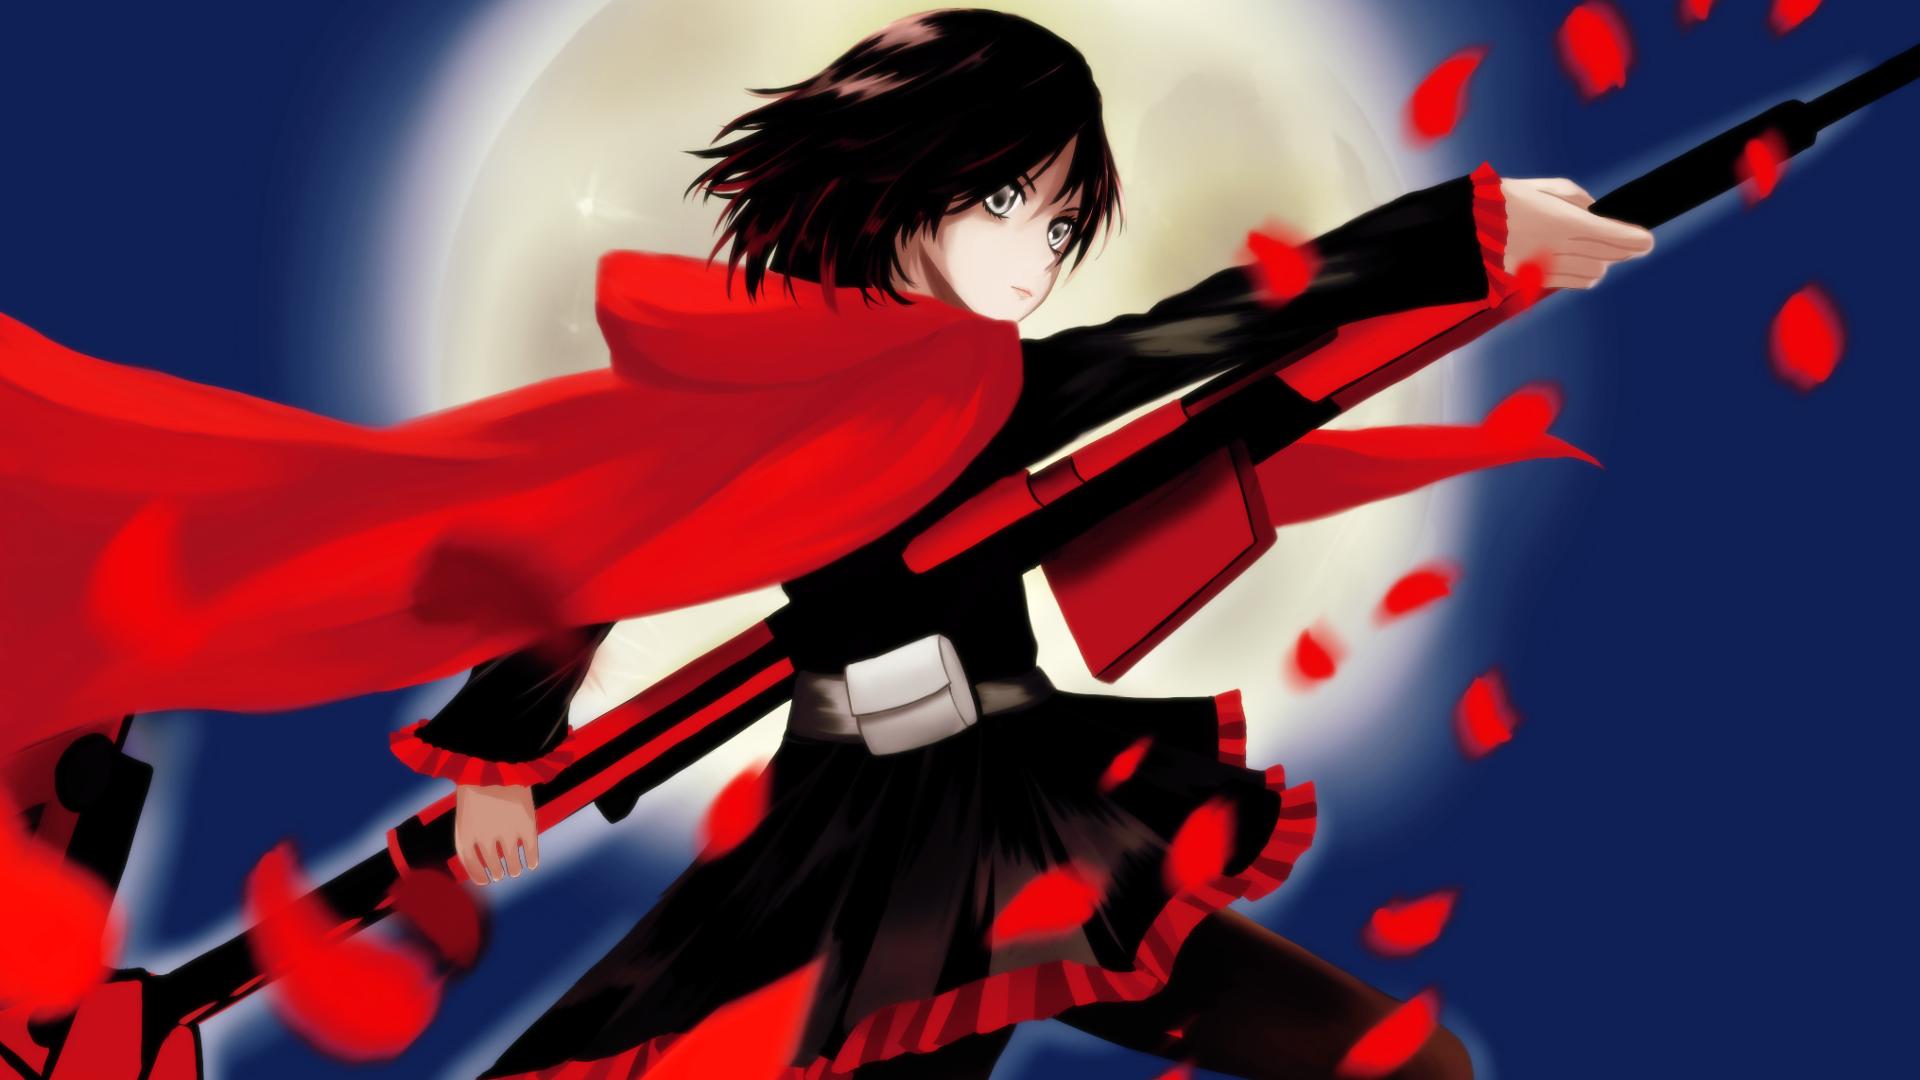 rwby anime scythe wallpaper - photo #32